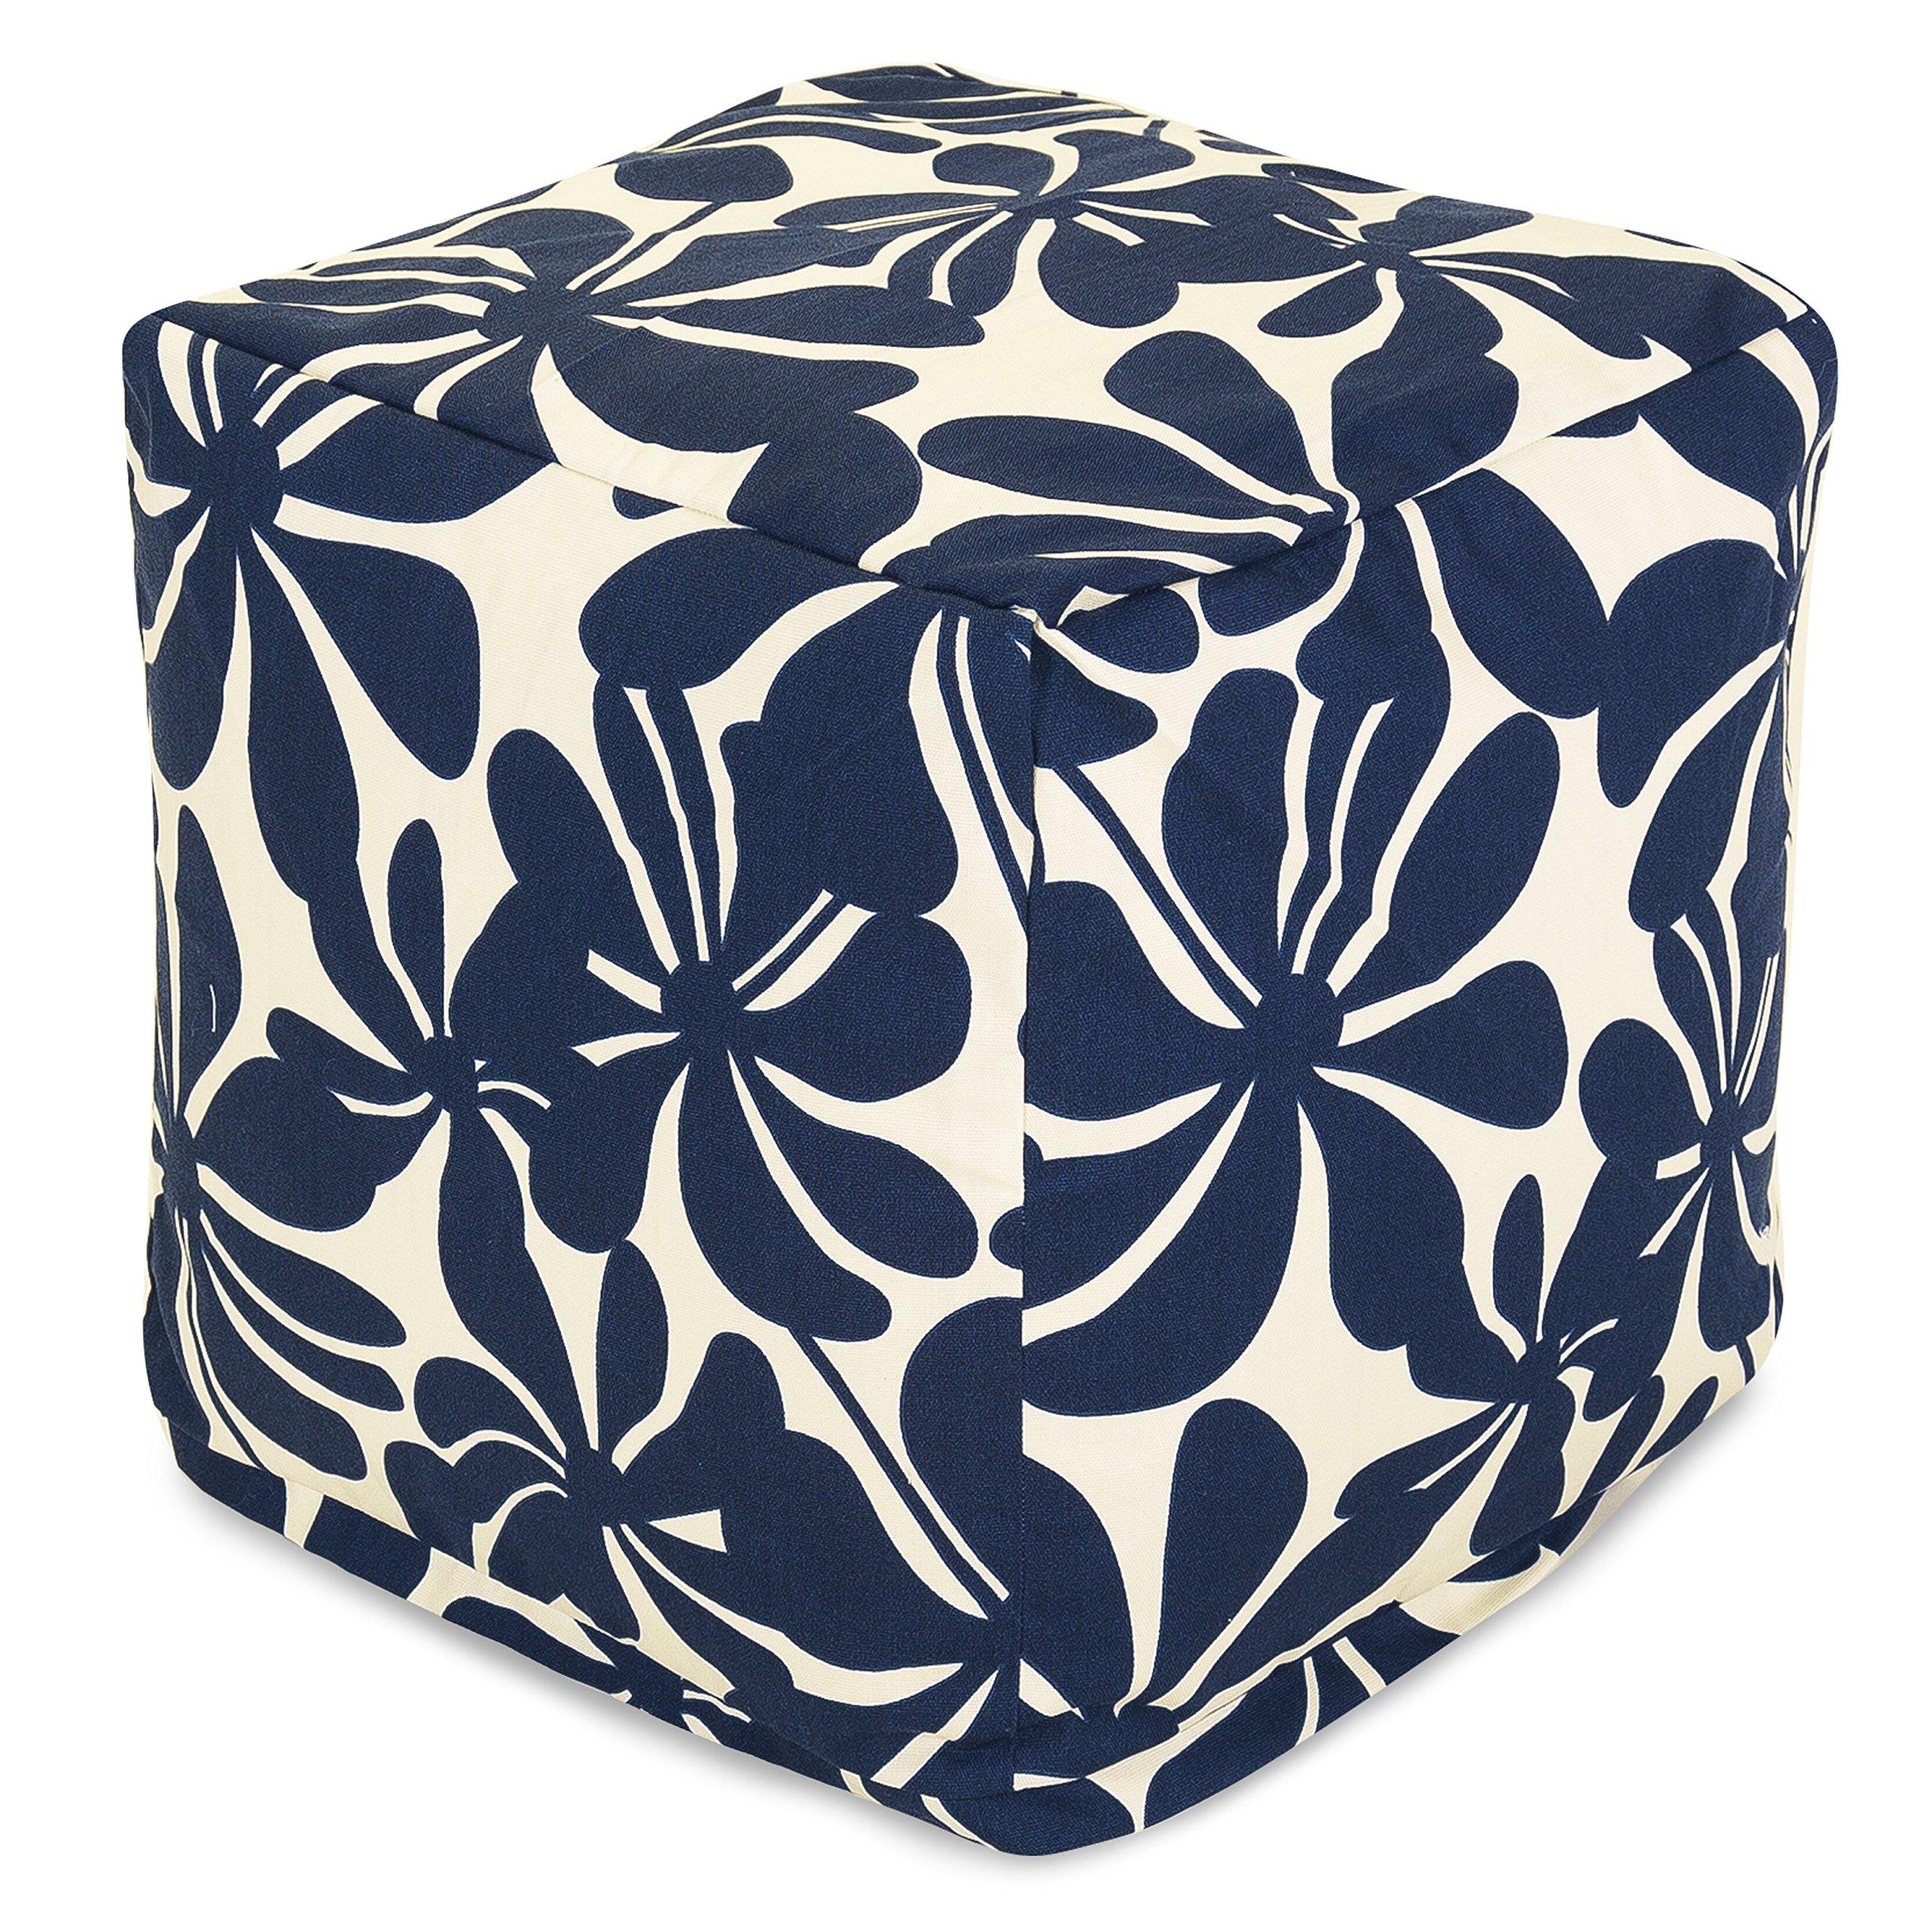 Majestic Home Goods Navy Blue Plantation Indoor/Outdoor Bean Bag Ottoman Pouf Cube 17'' L x 17'' W x 17'' H